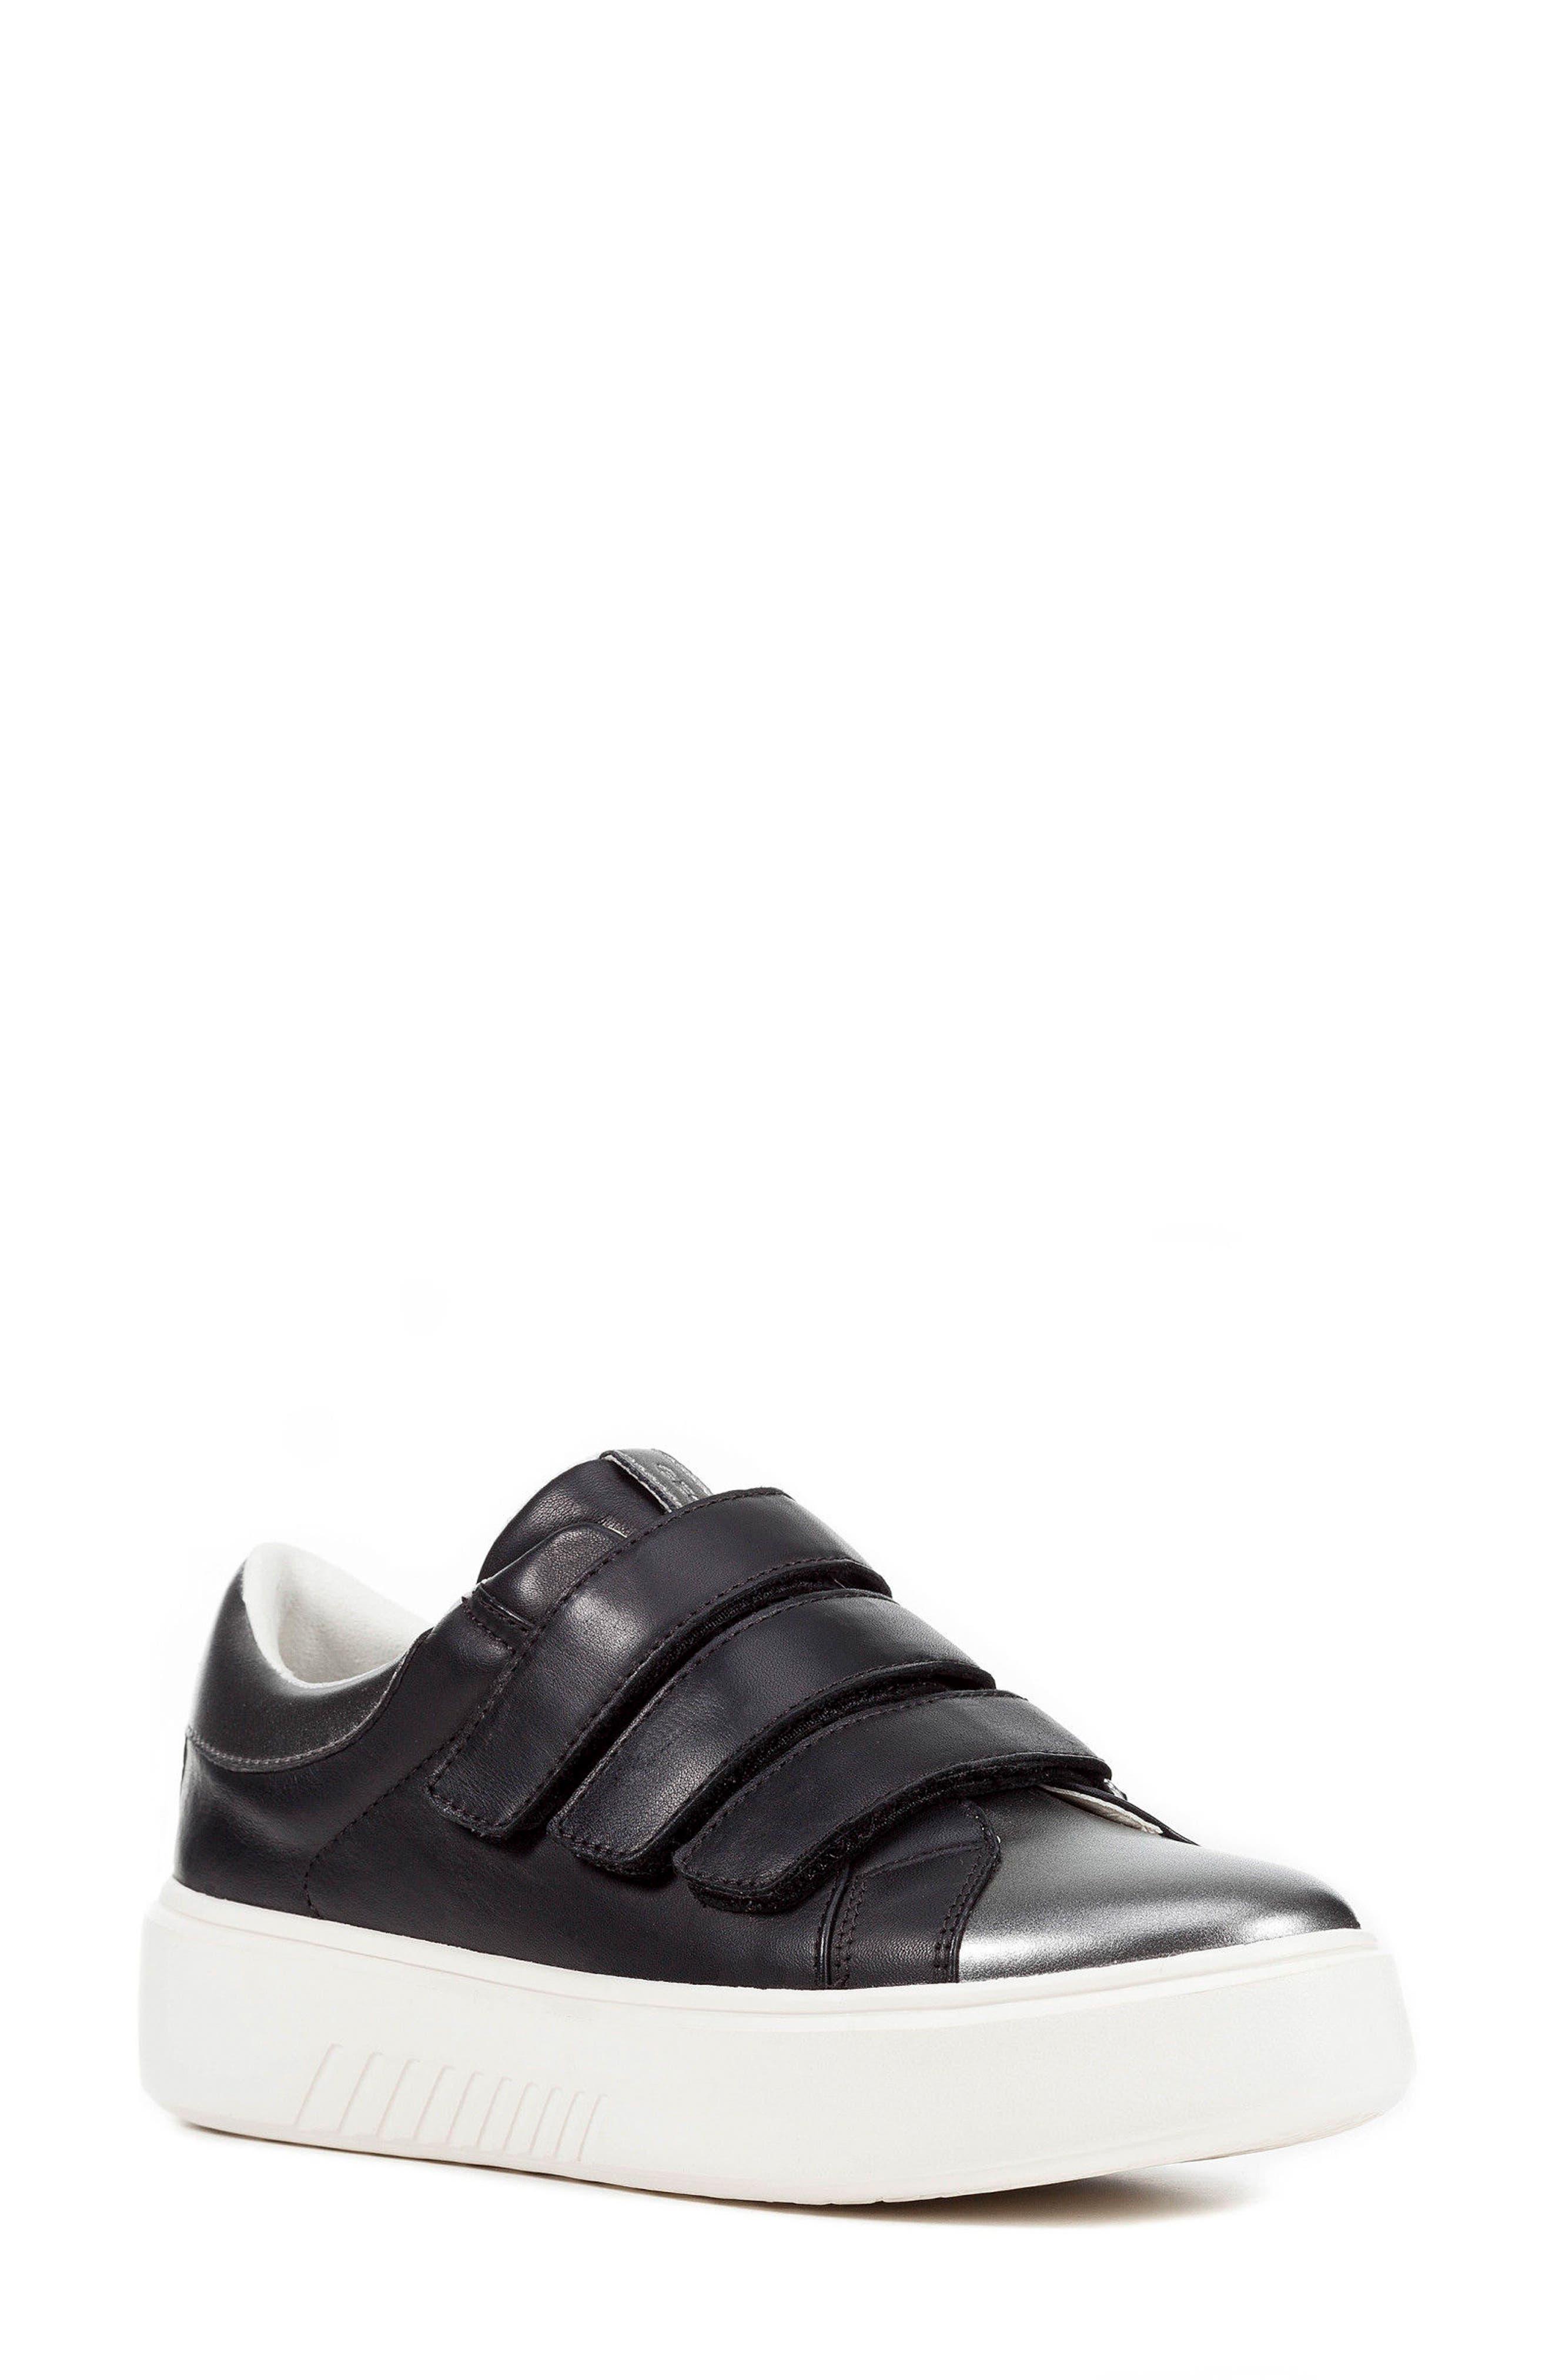 Nhenbus 3 Sneaker,                         Main,                         color, BLACK LEATHER